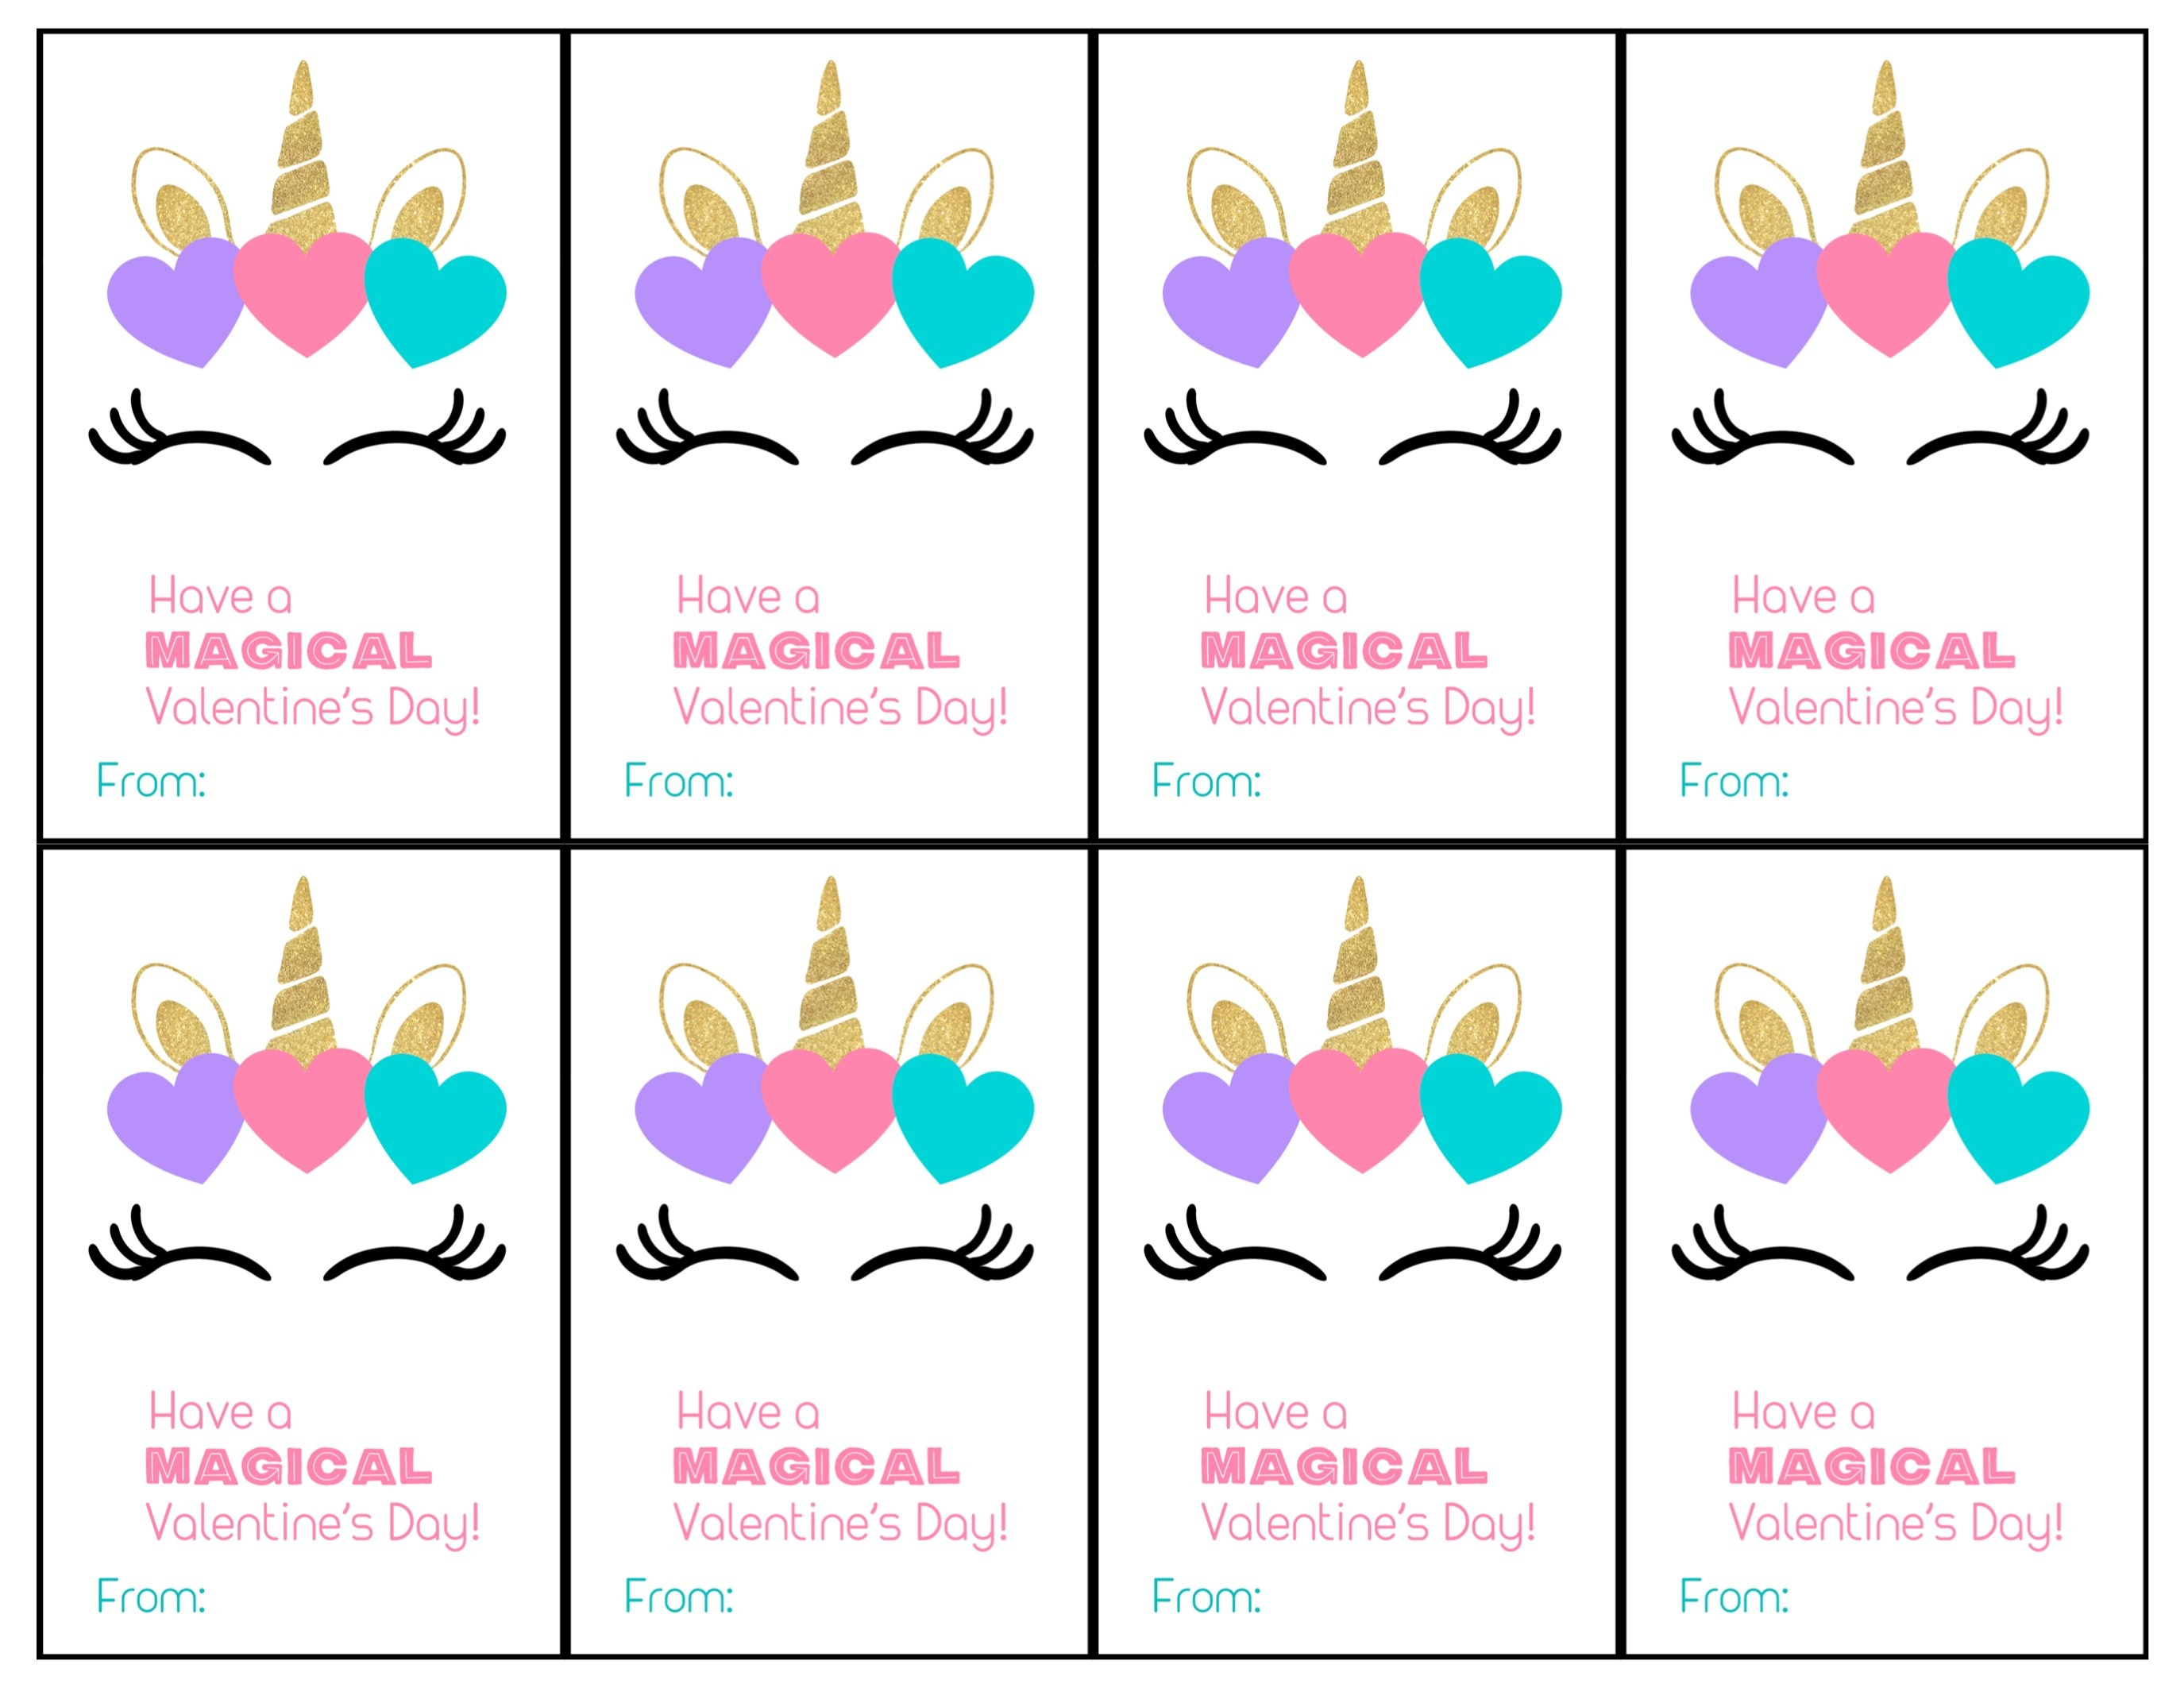 Free Printable Unicorn Valentine Cards - Paper Trail Design - Valentine Free Printable Cards